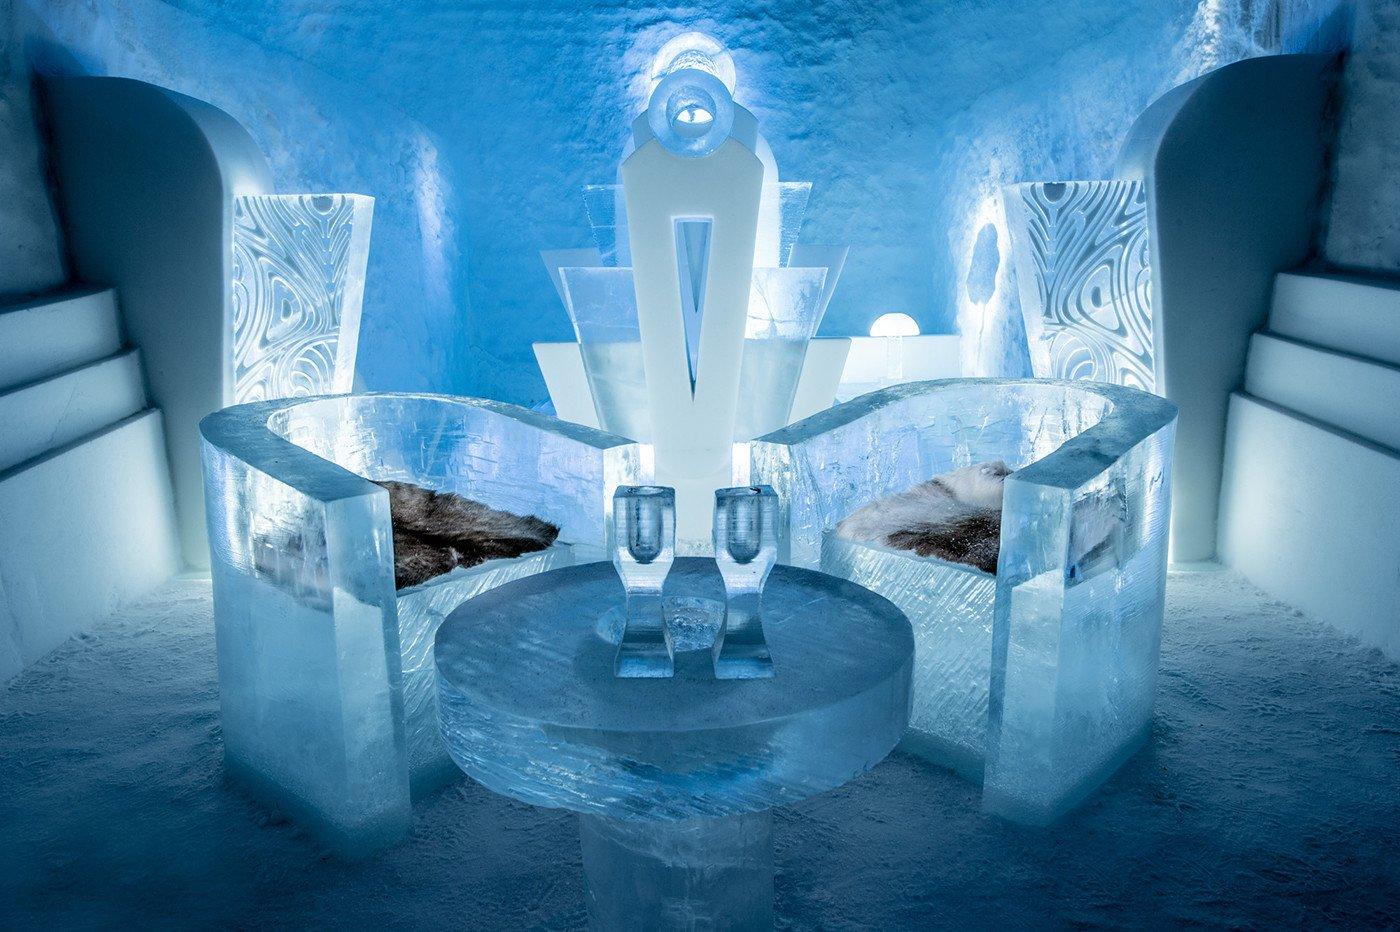 Salottino dell'IceHotel Jukkasjärvi, Lapponia svedese